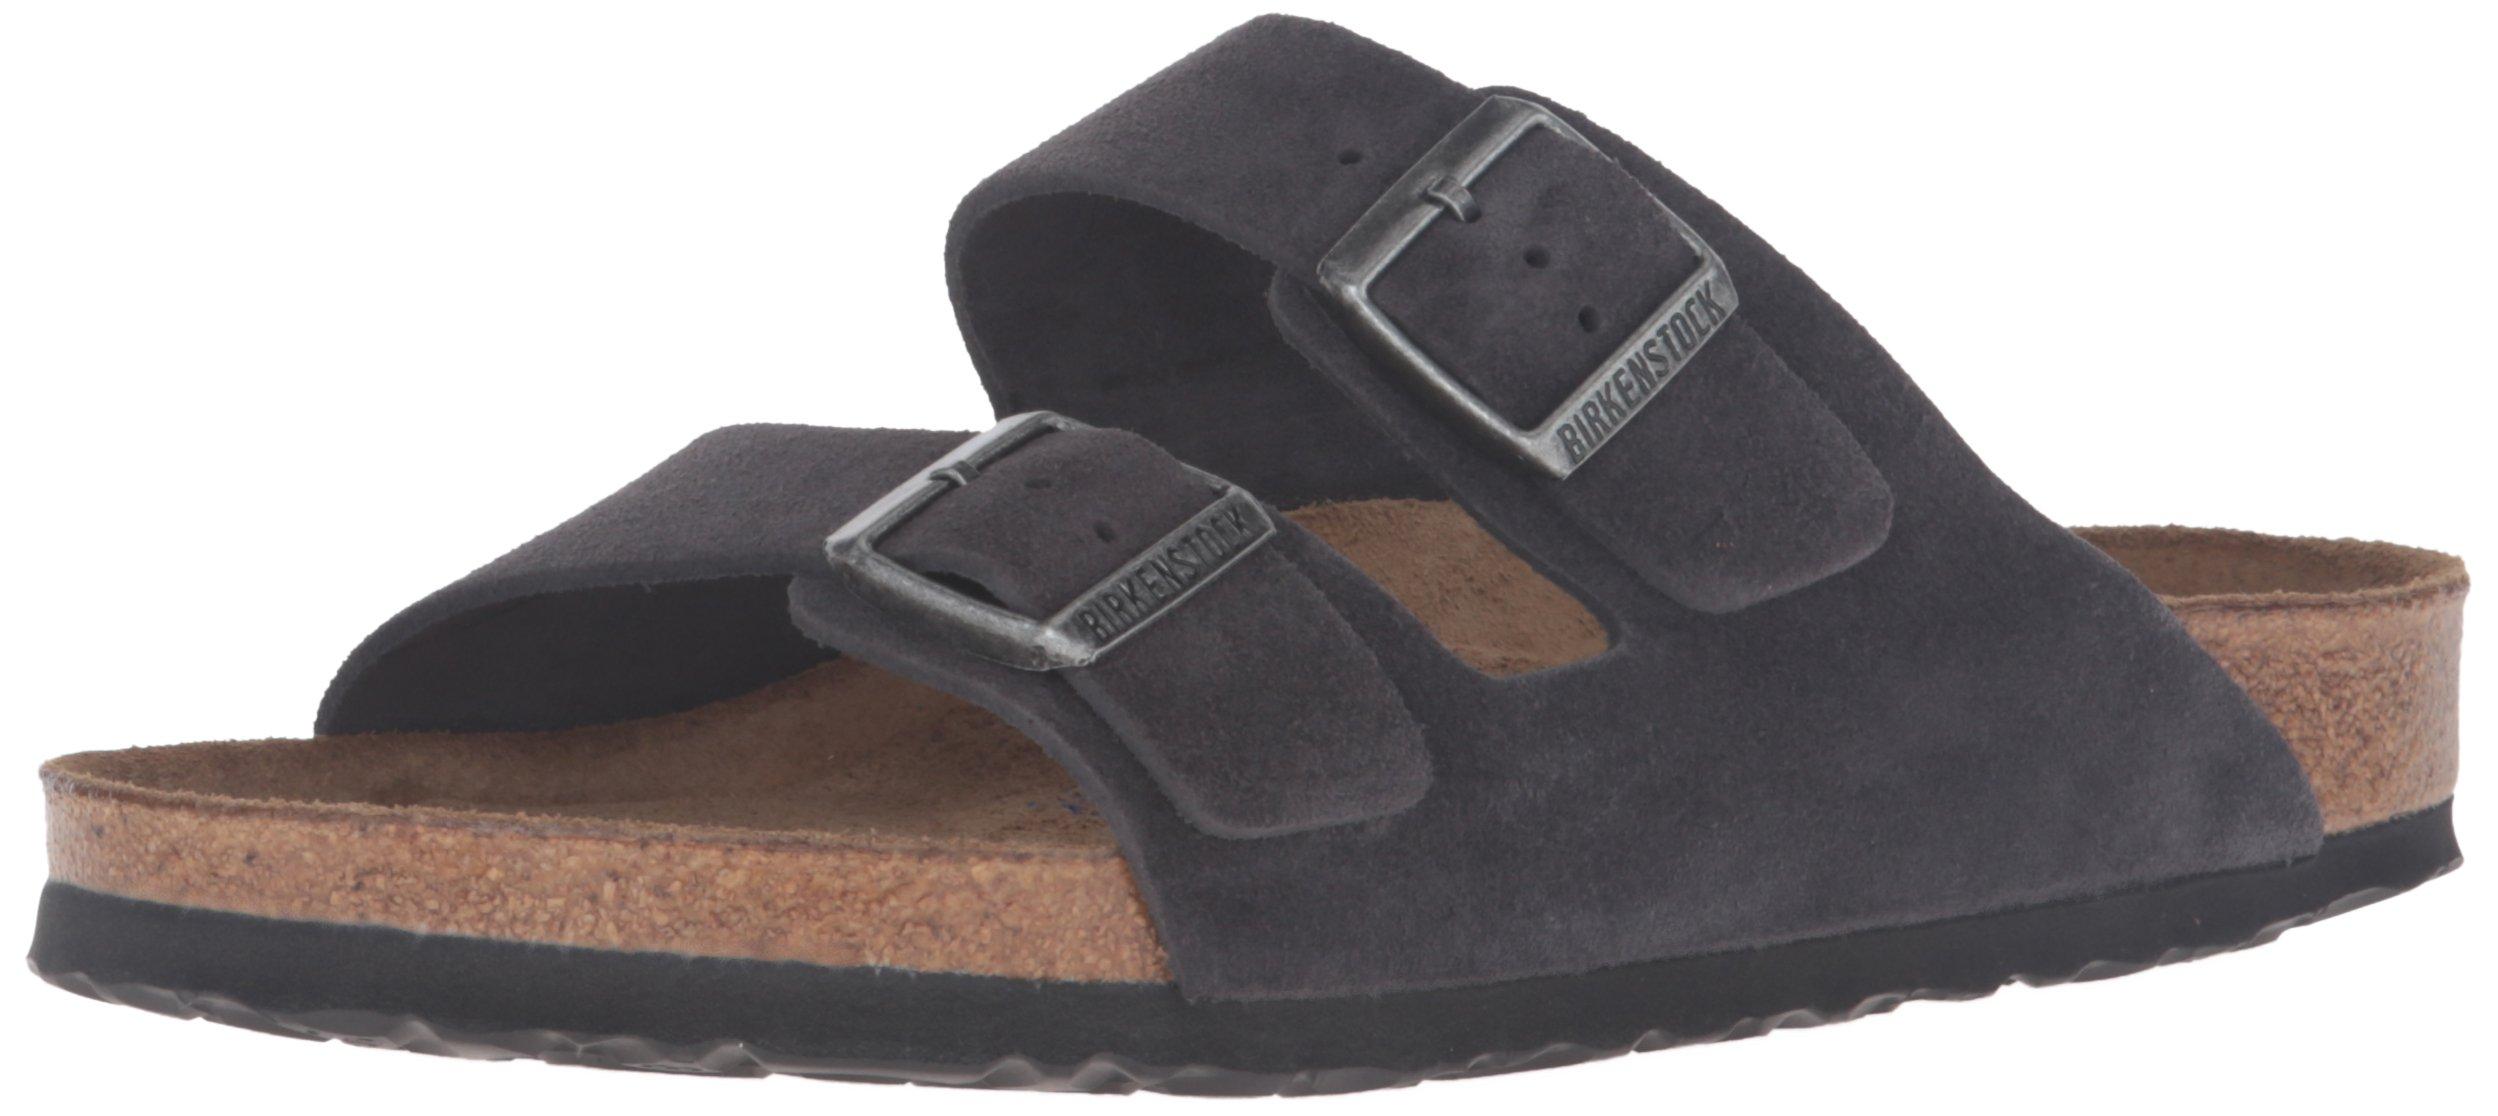 Birkenstock Unisex Arizona Velvet Gray Sandals - 44 M EU / 11-11.5 D(M) US